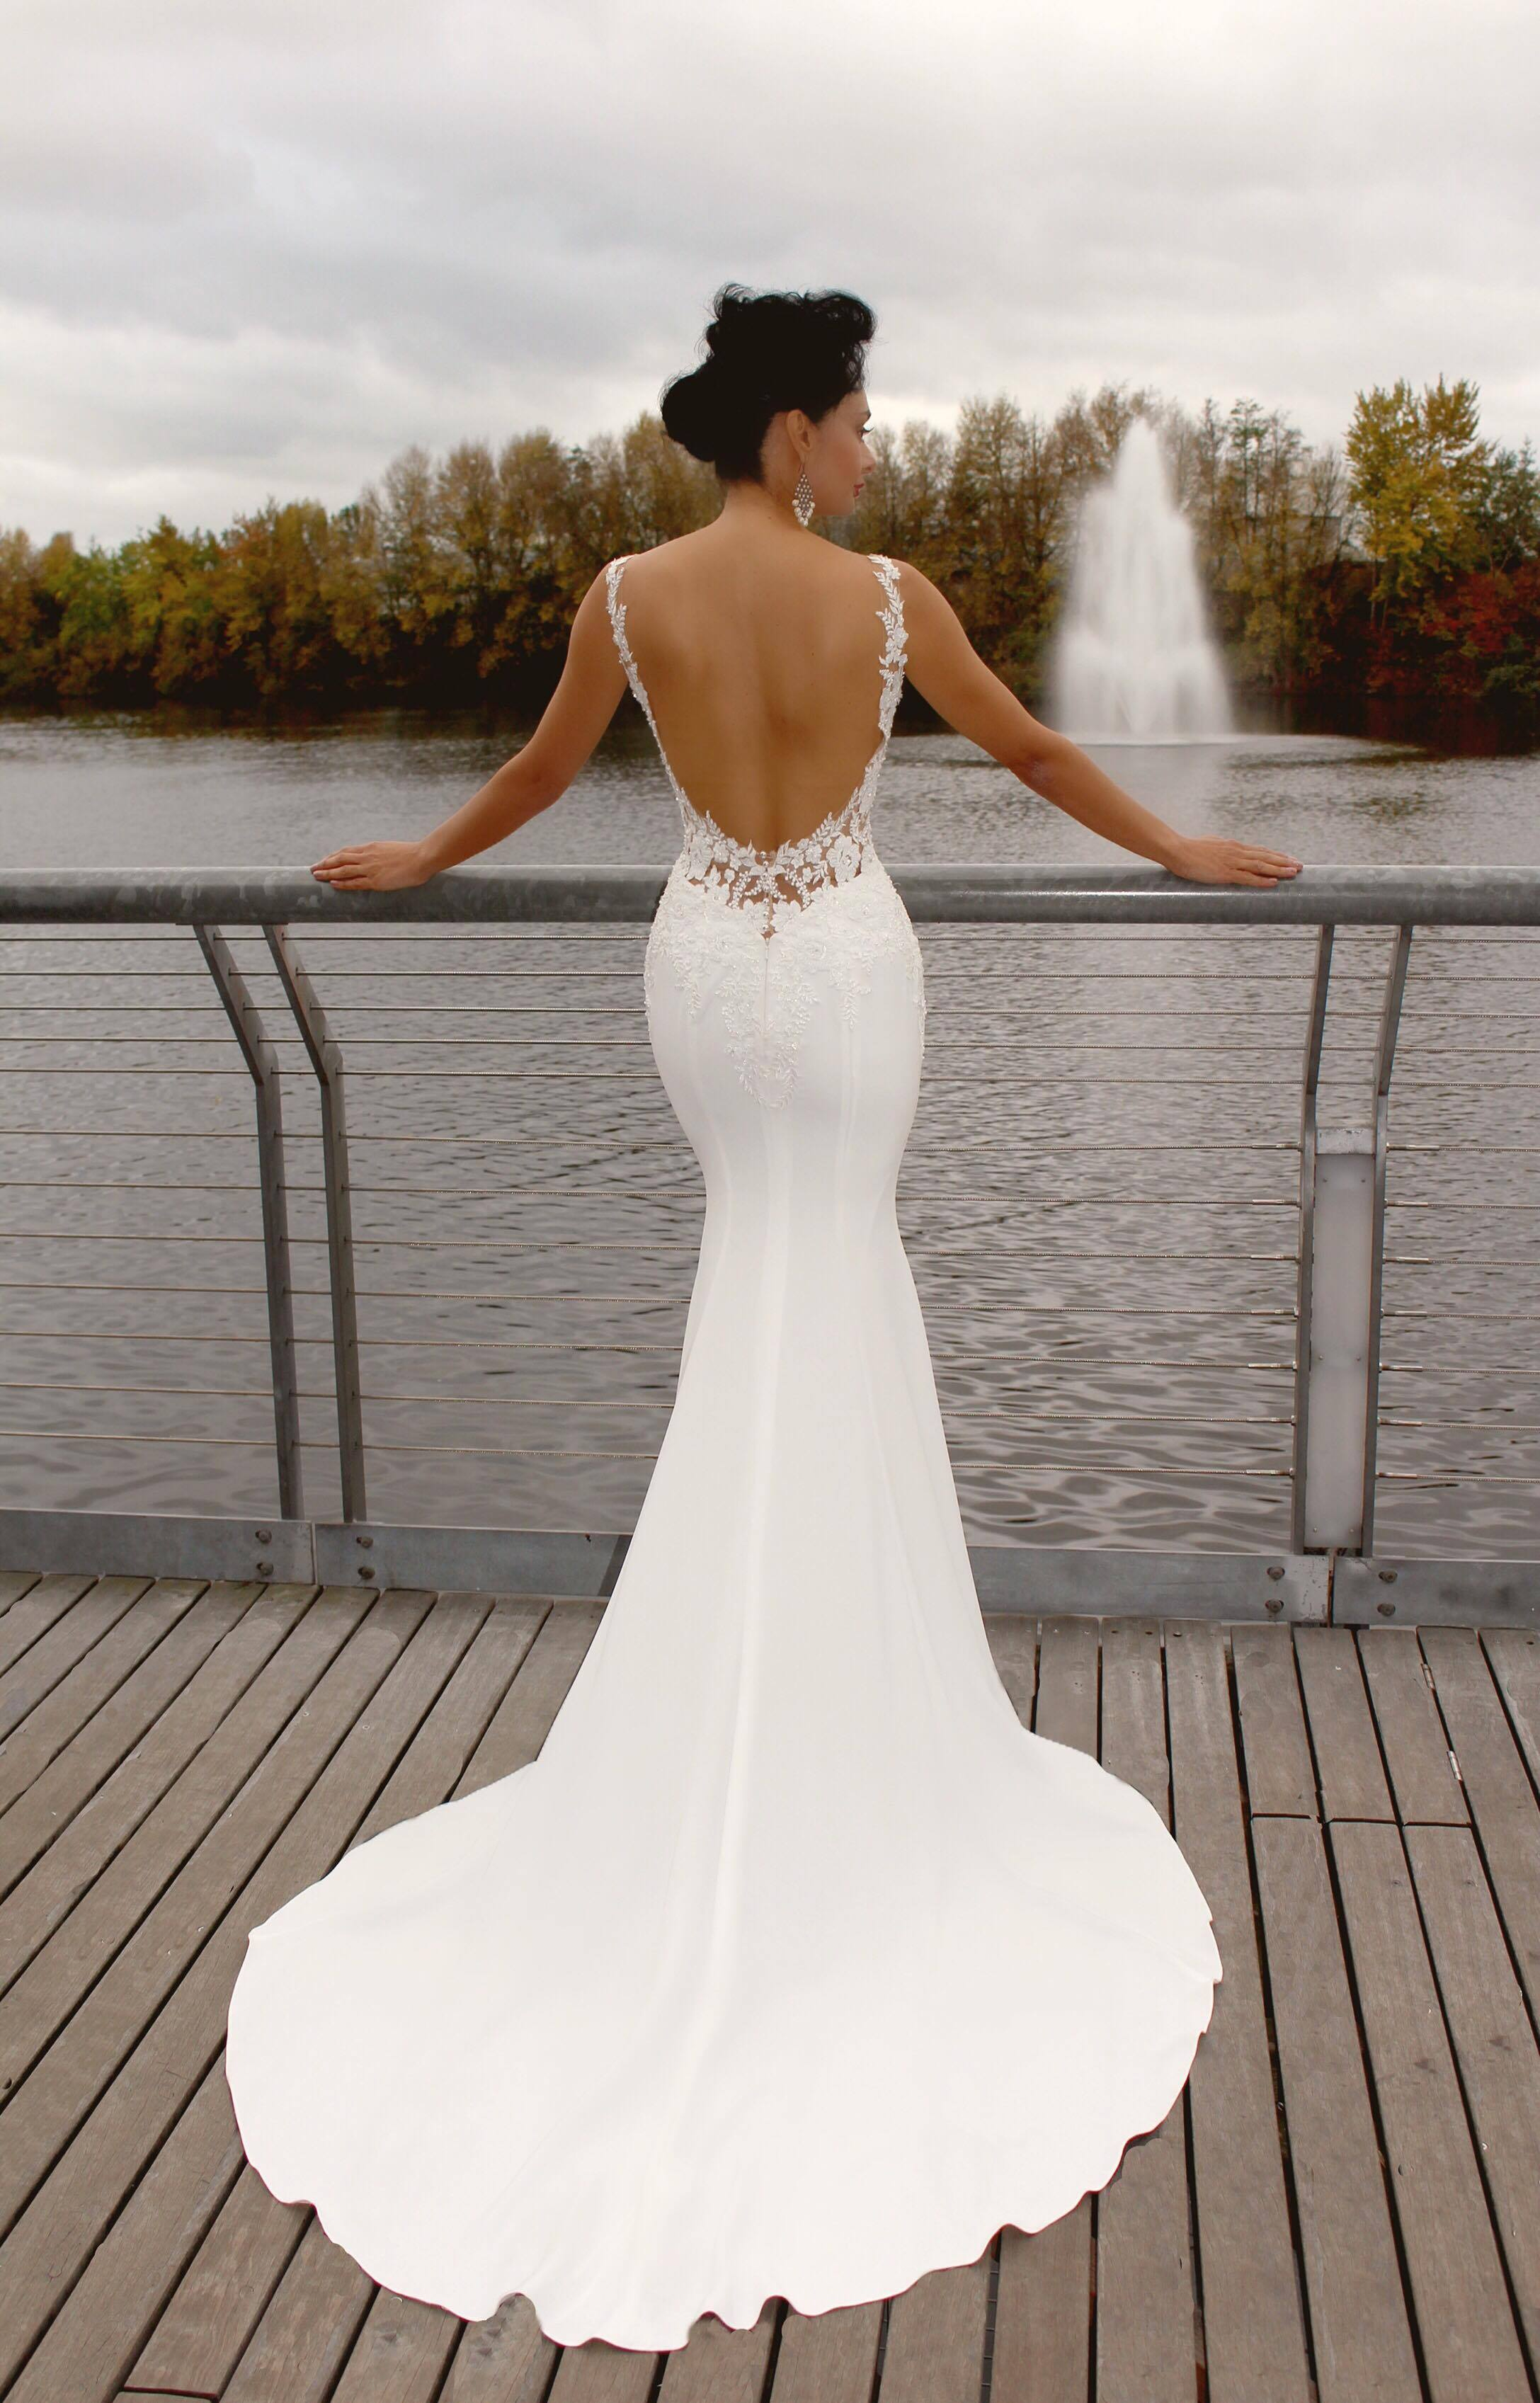 leicester bridal boutique